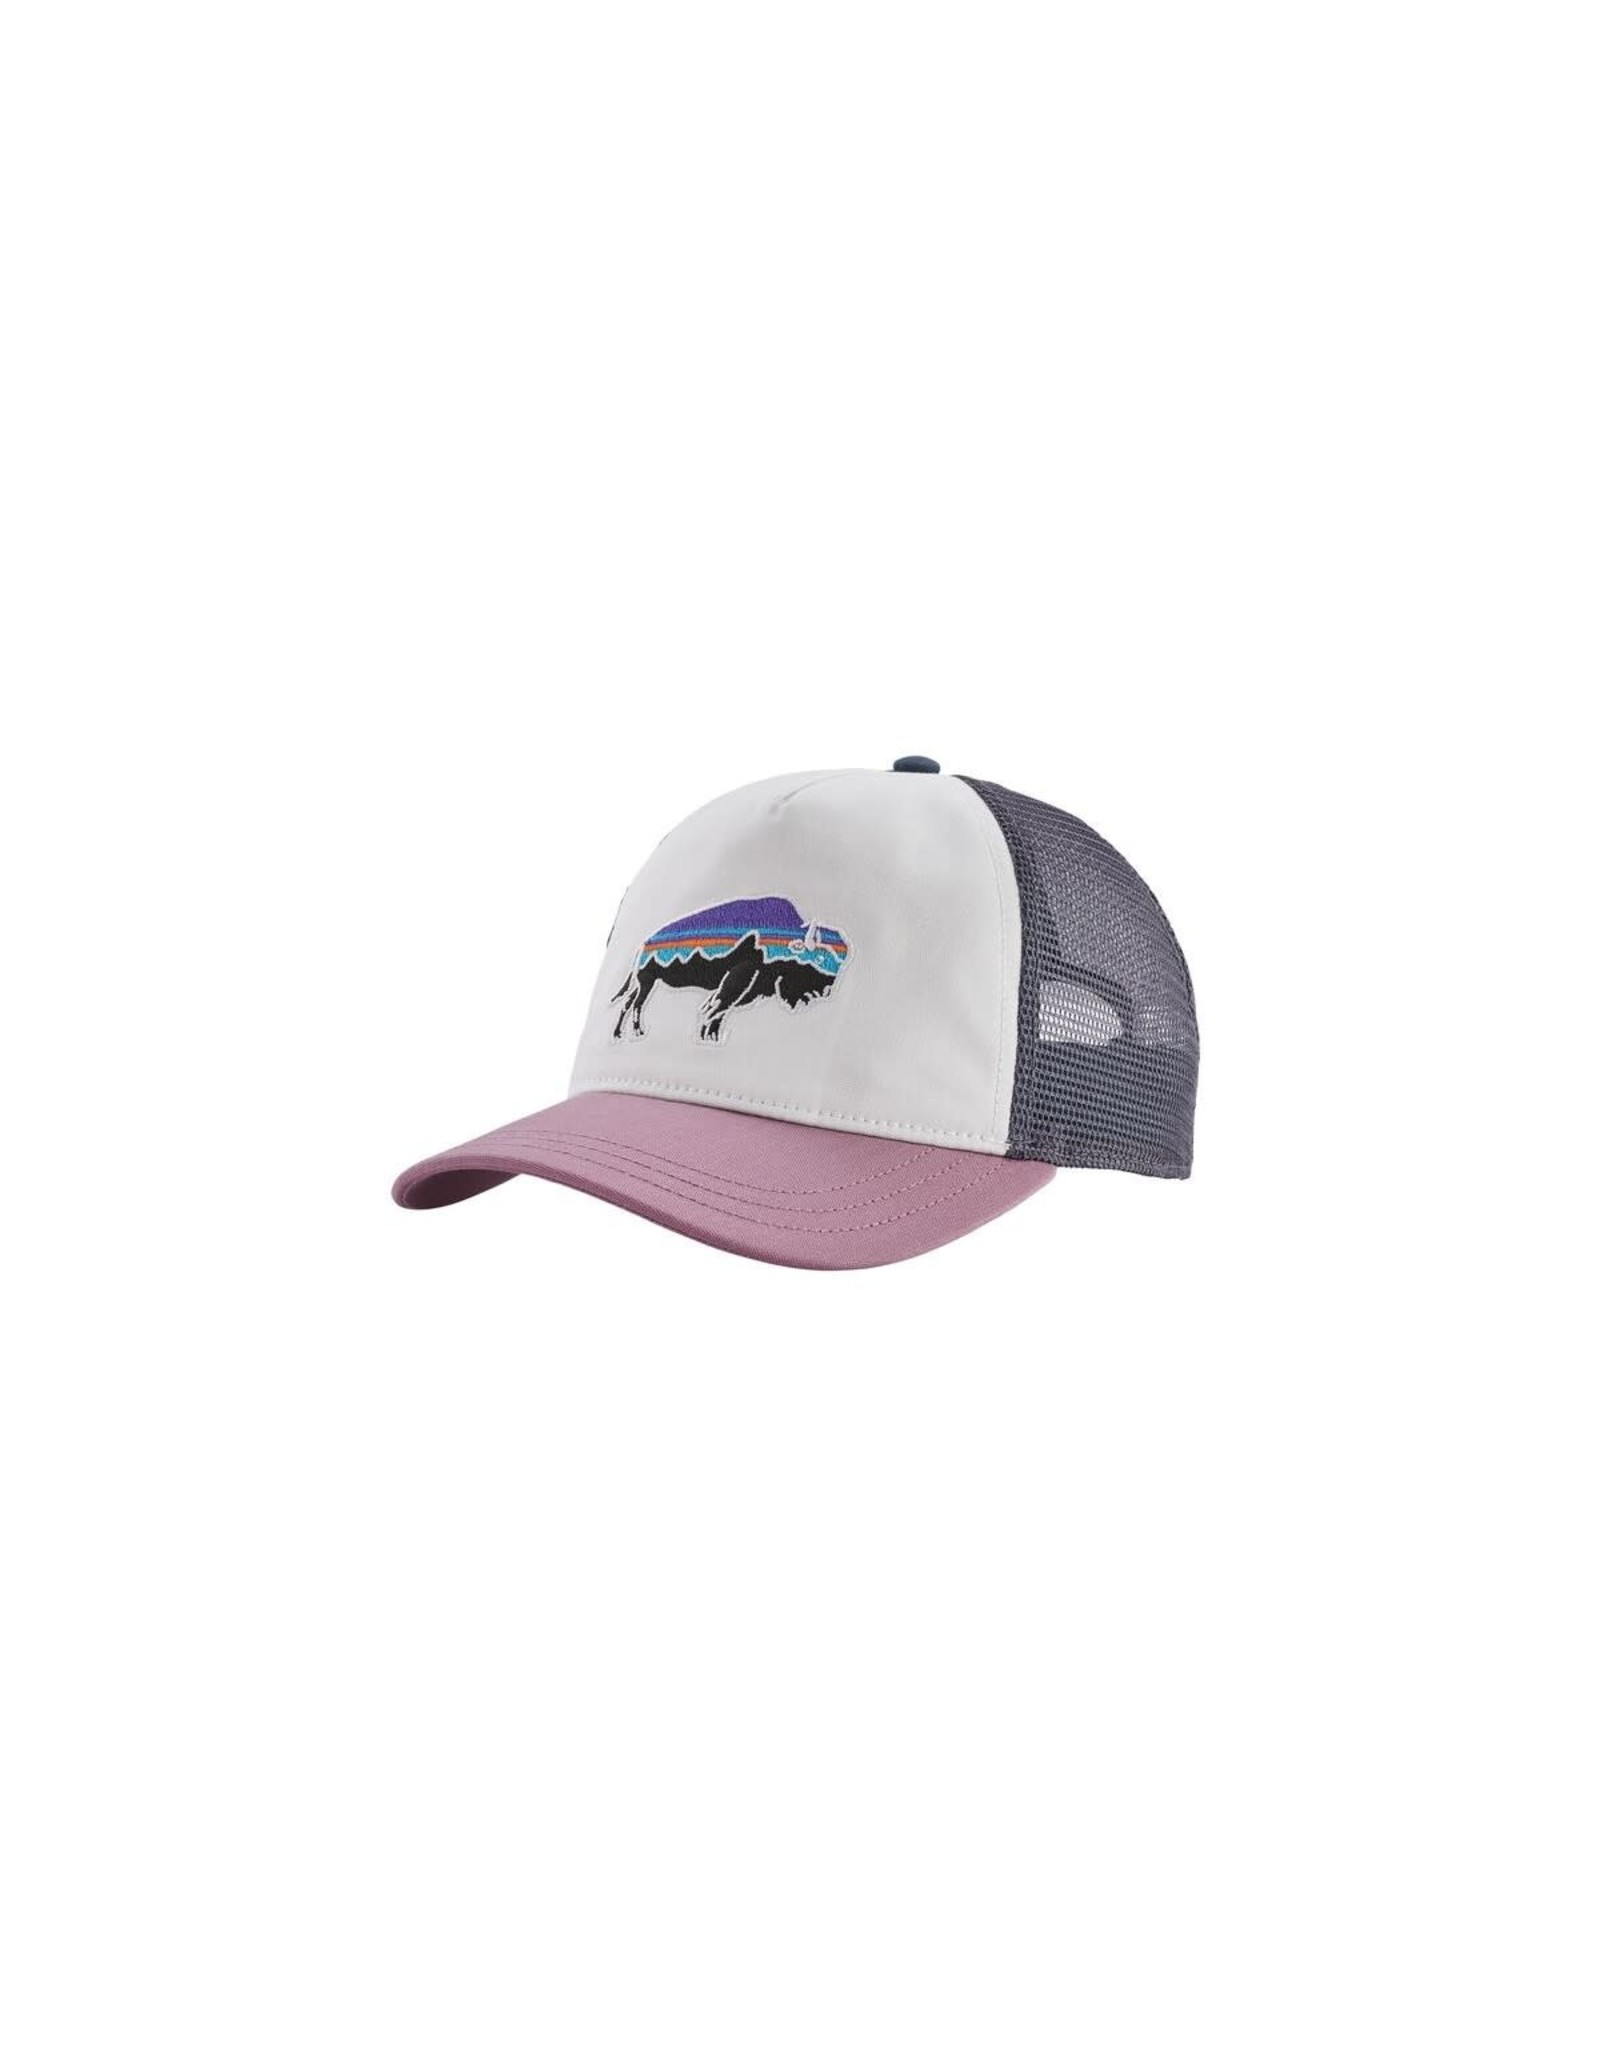 Patagonia W's Fitz Roy Bison Layback Trucker Hat